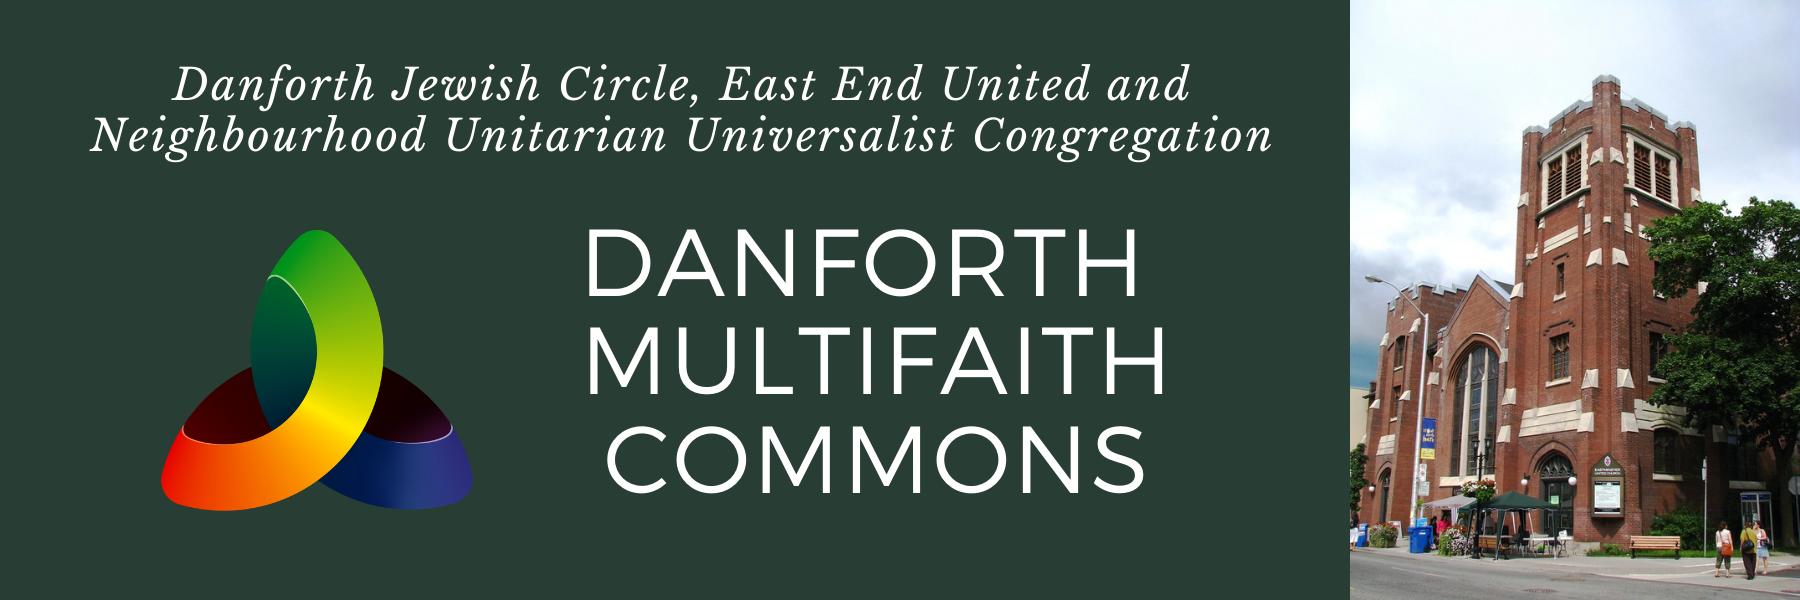 Danforth Multifaith Commons